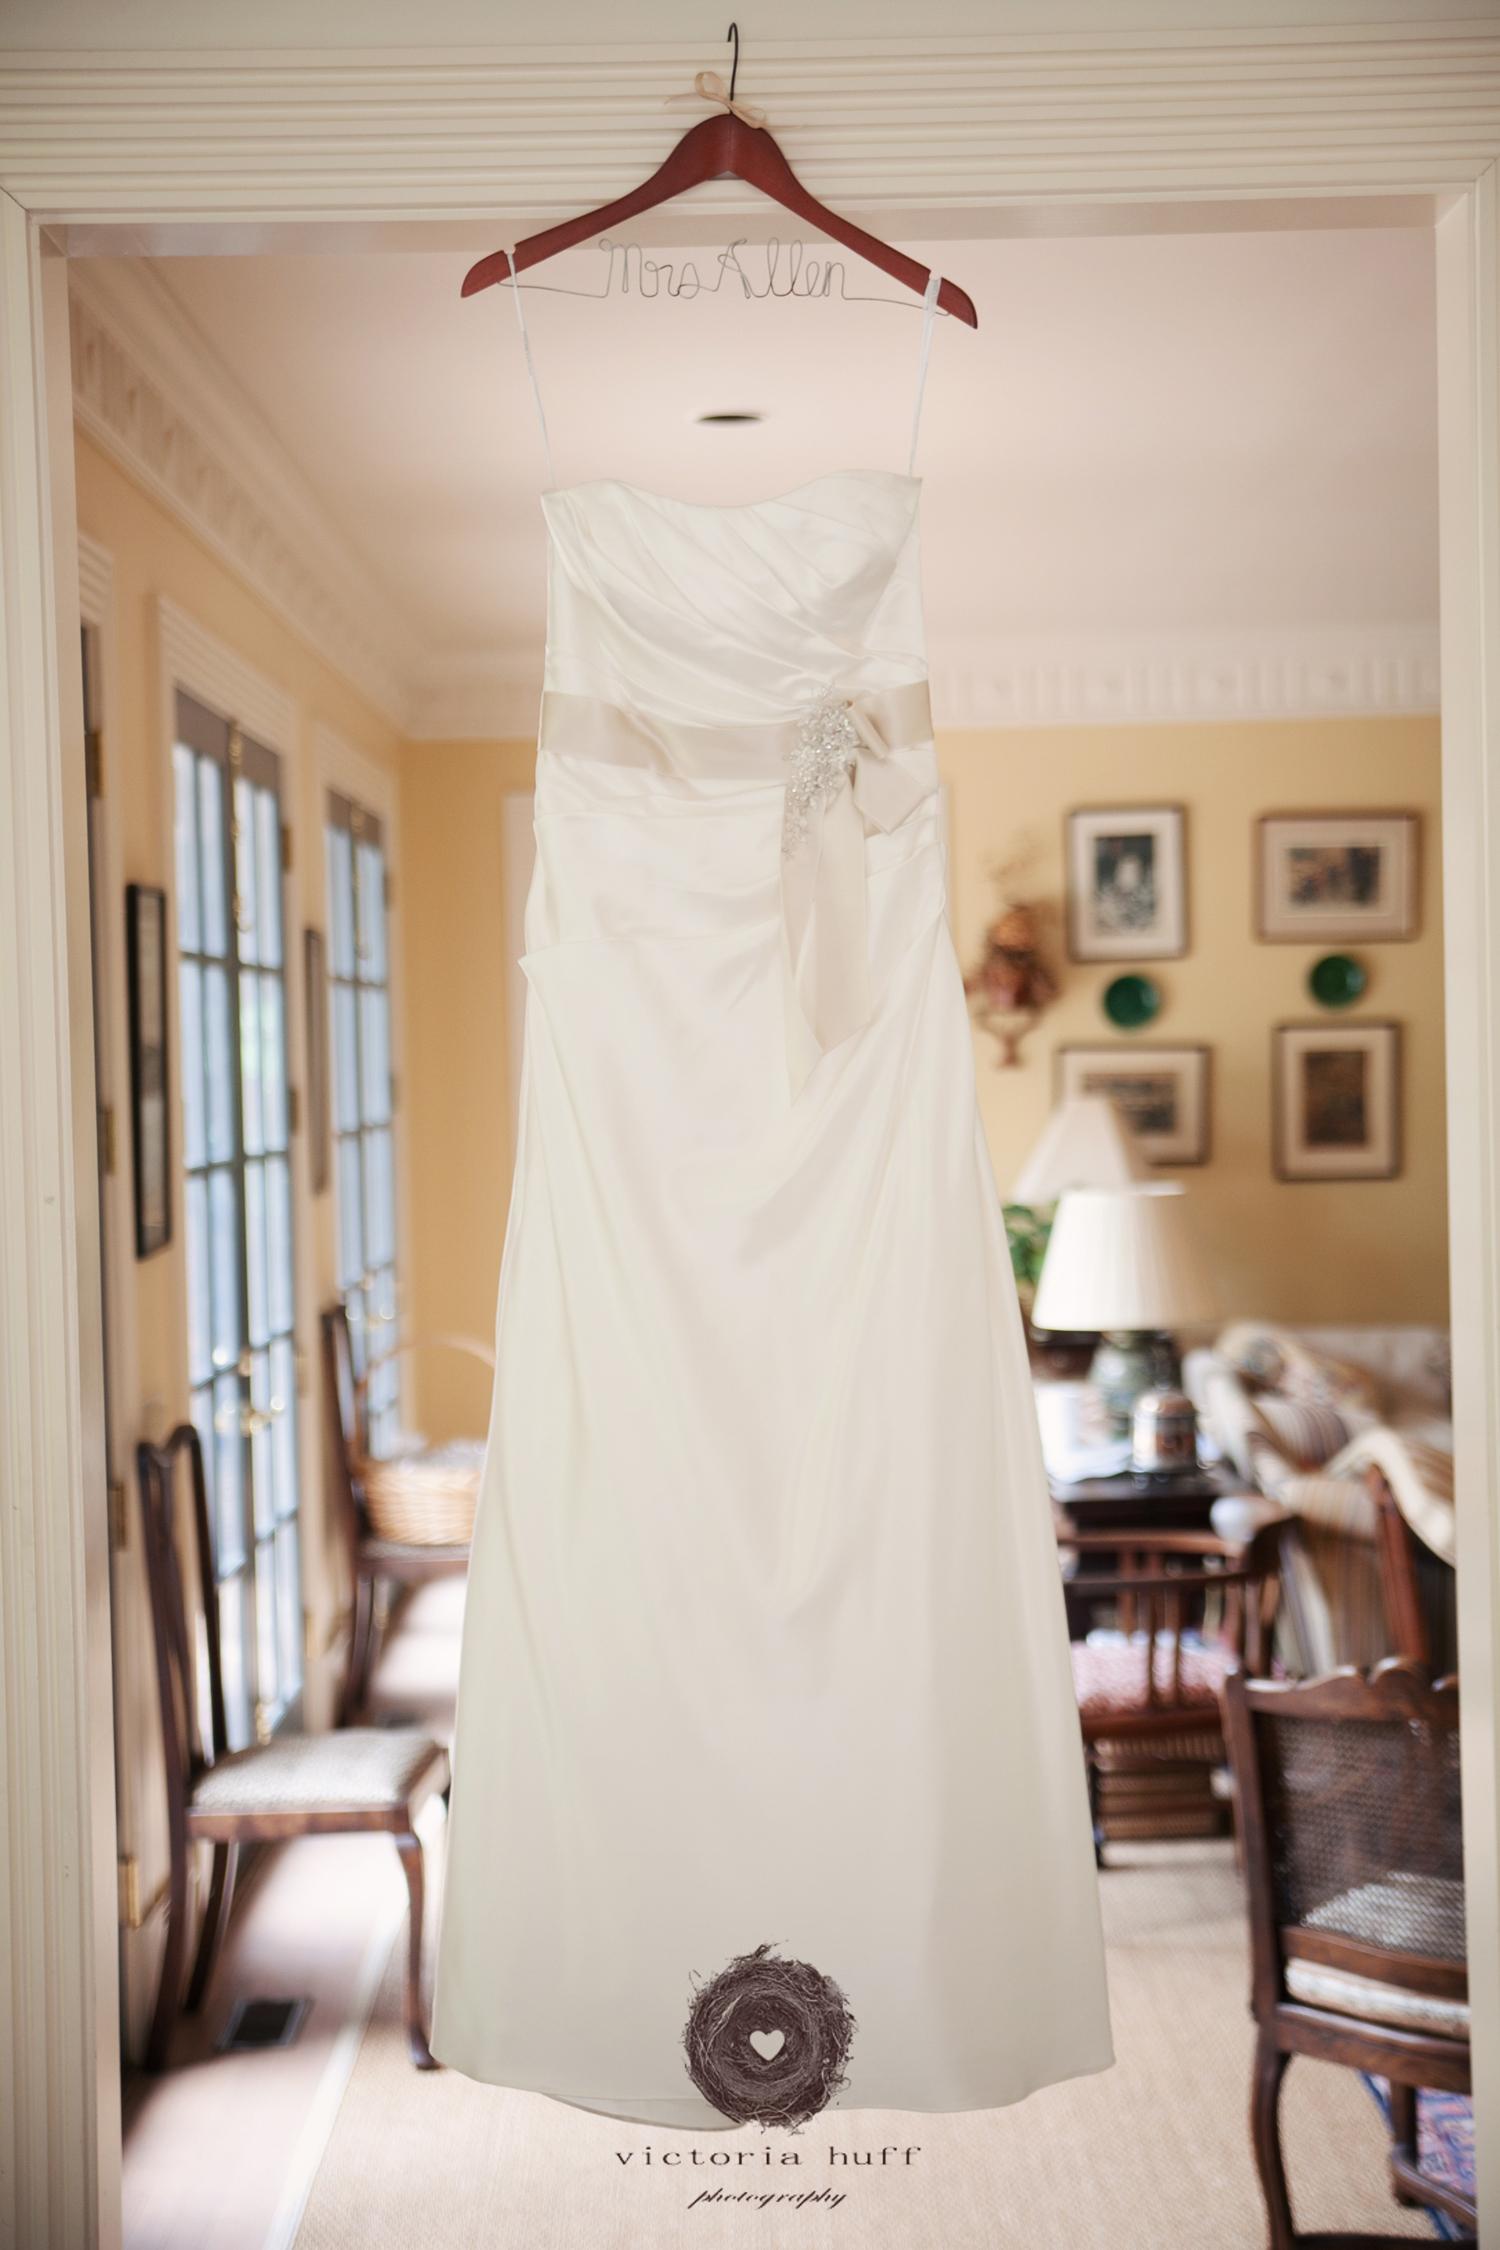 Wedding-Photography-Holly-Eisele-Clint-Allen-Athens-Georgia-Vintage-Wedding-dress-017.jpg